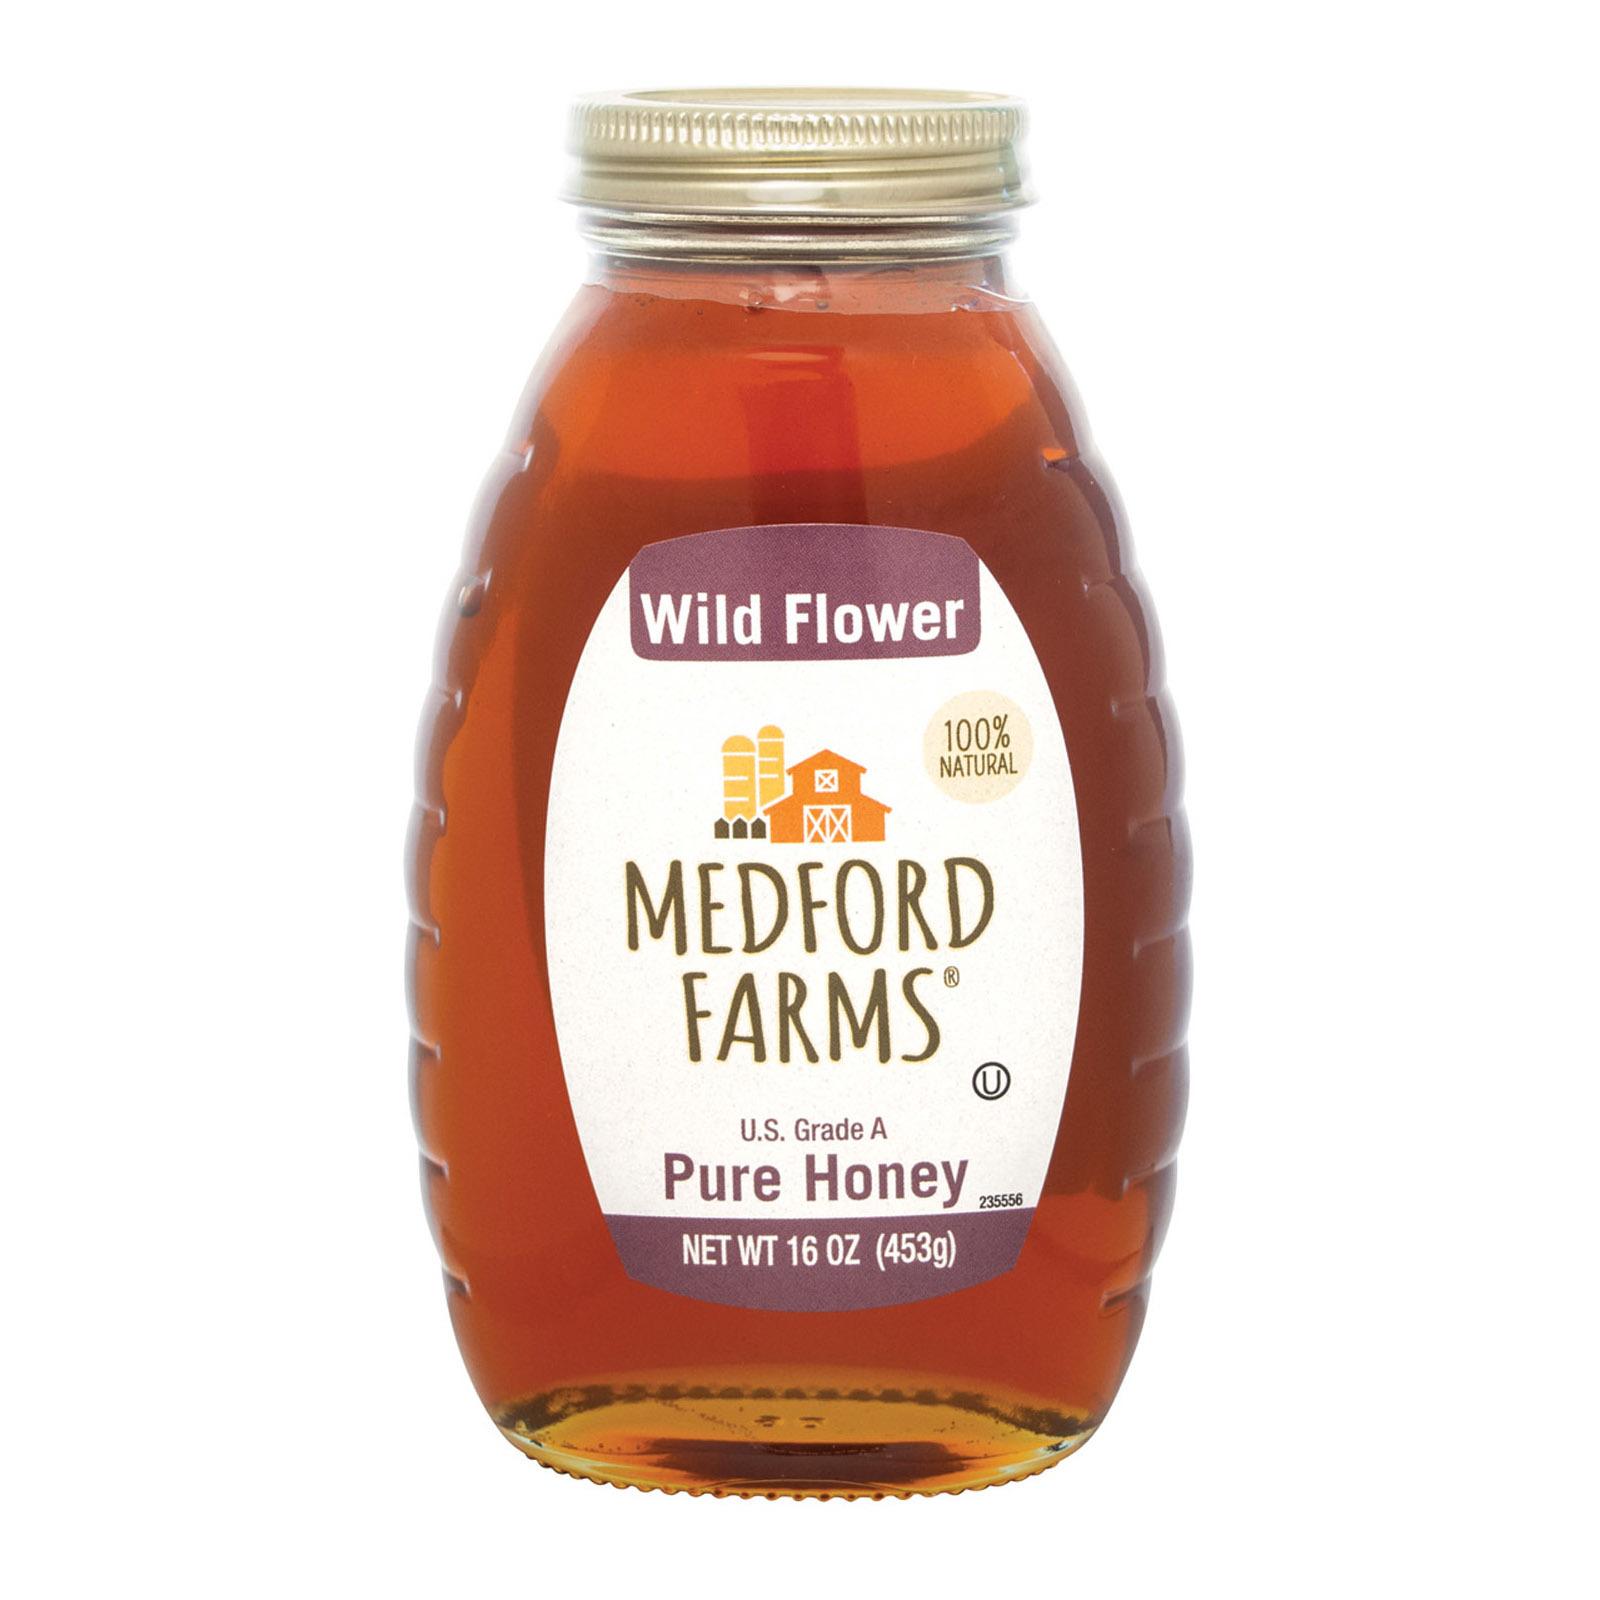 Medford Farms Honey - Wild Flower - Case of 12 - 16 oz